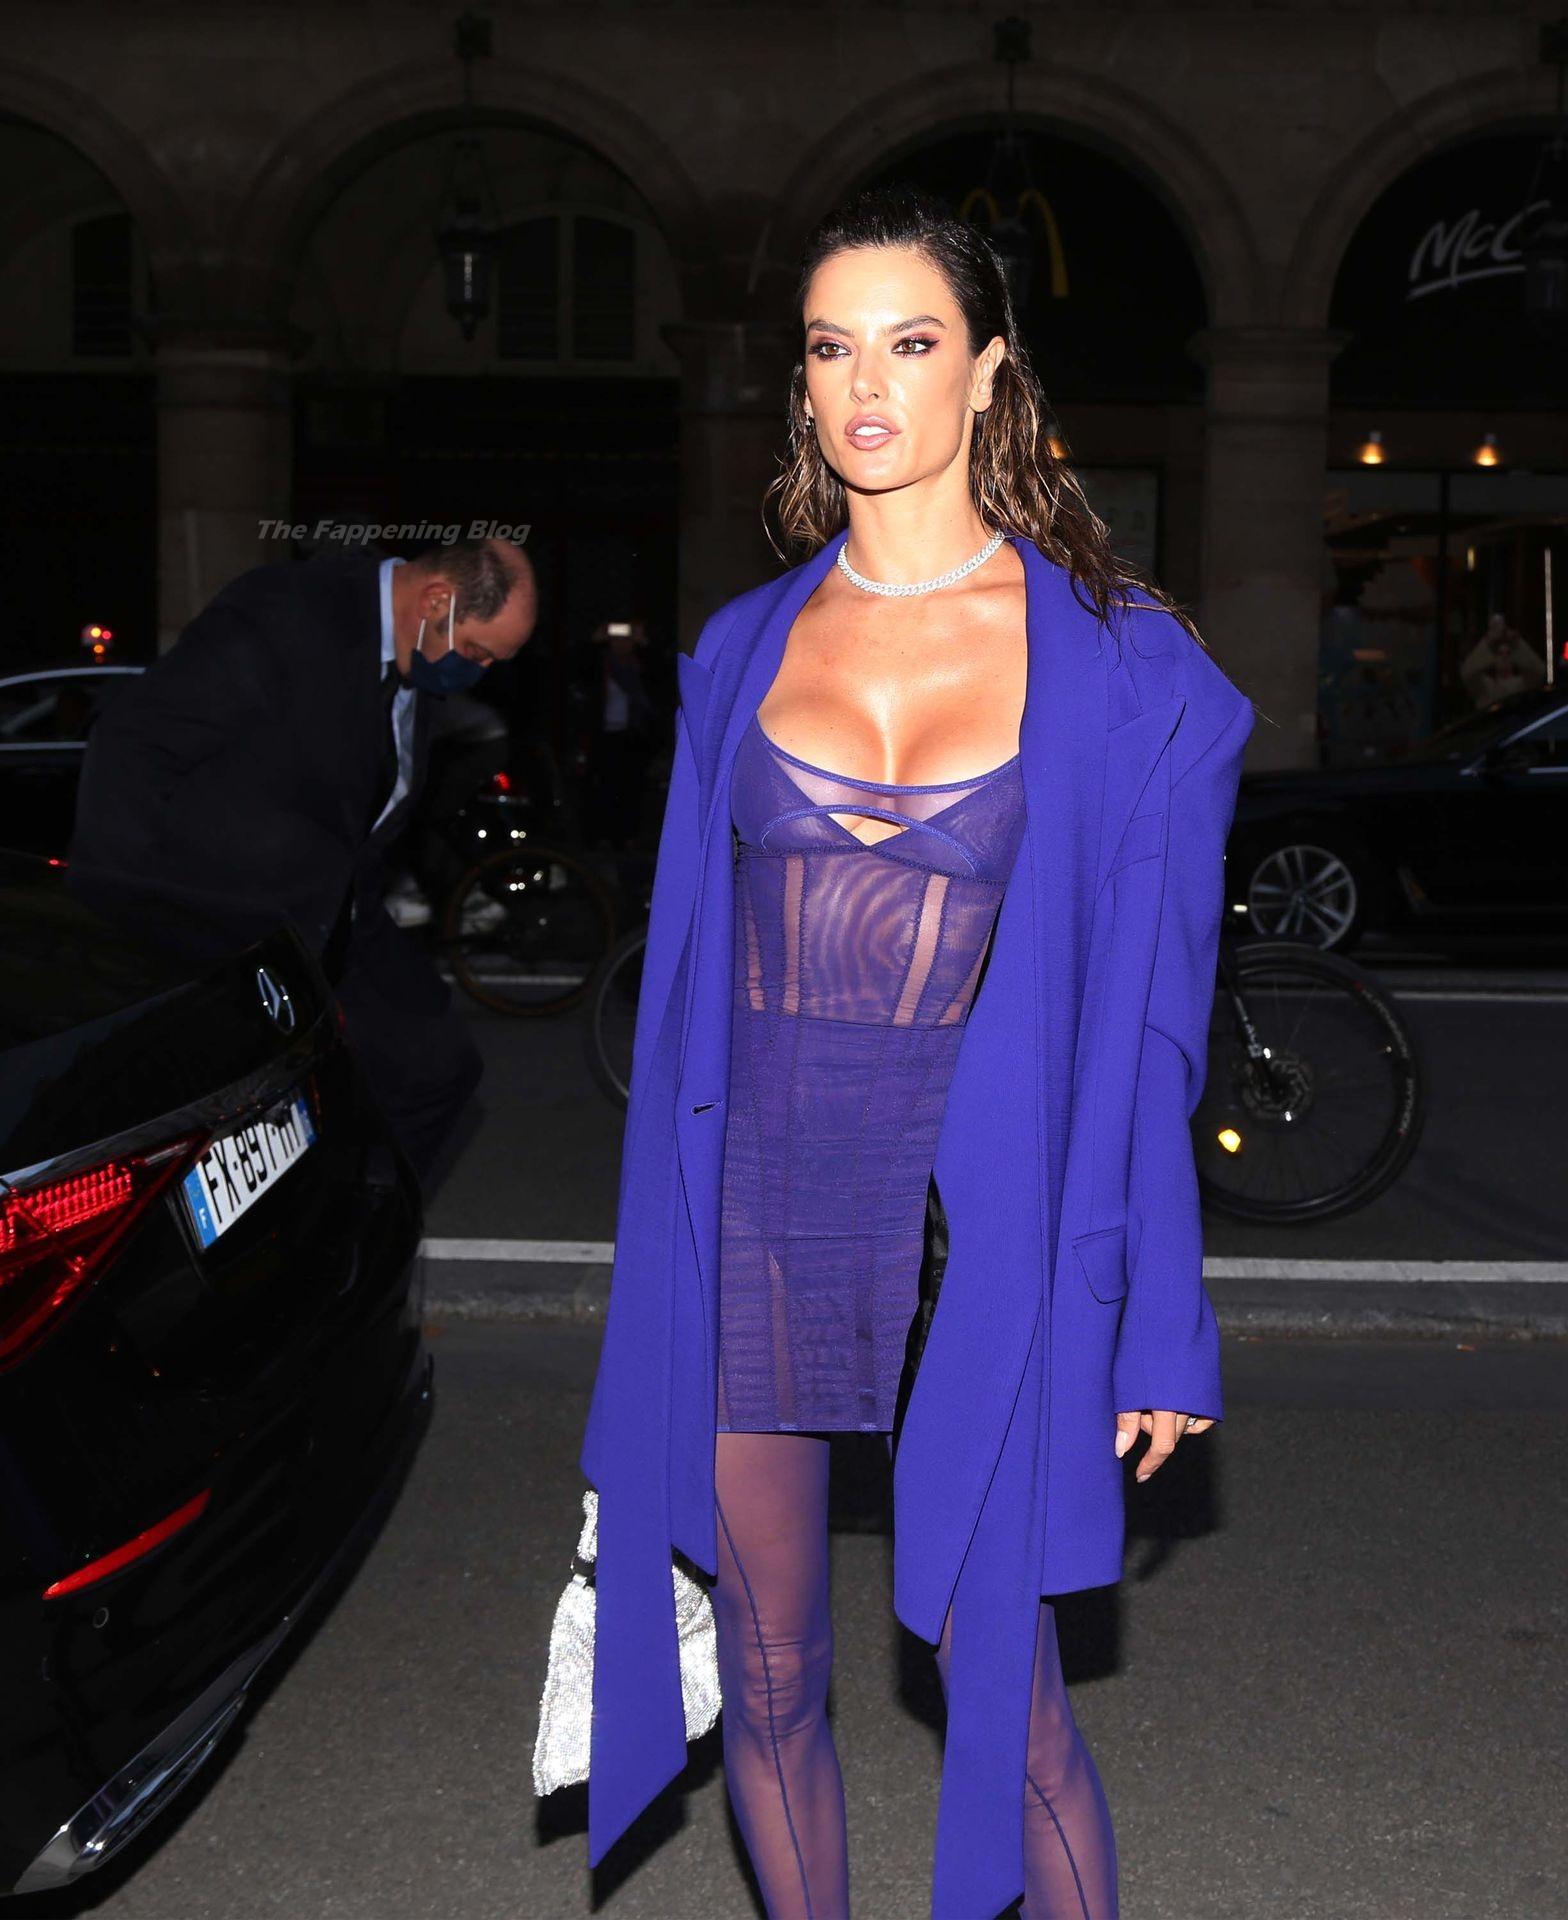 Alessandra-Ambrosio-Sexy-The-Fappening-Blog-46-1.jpg